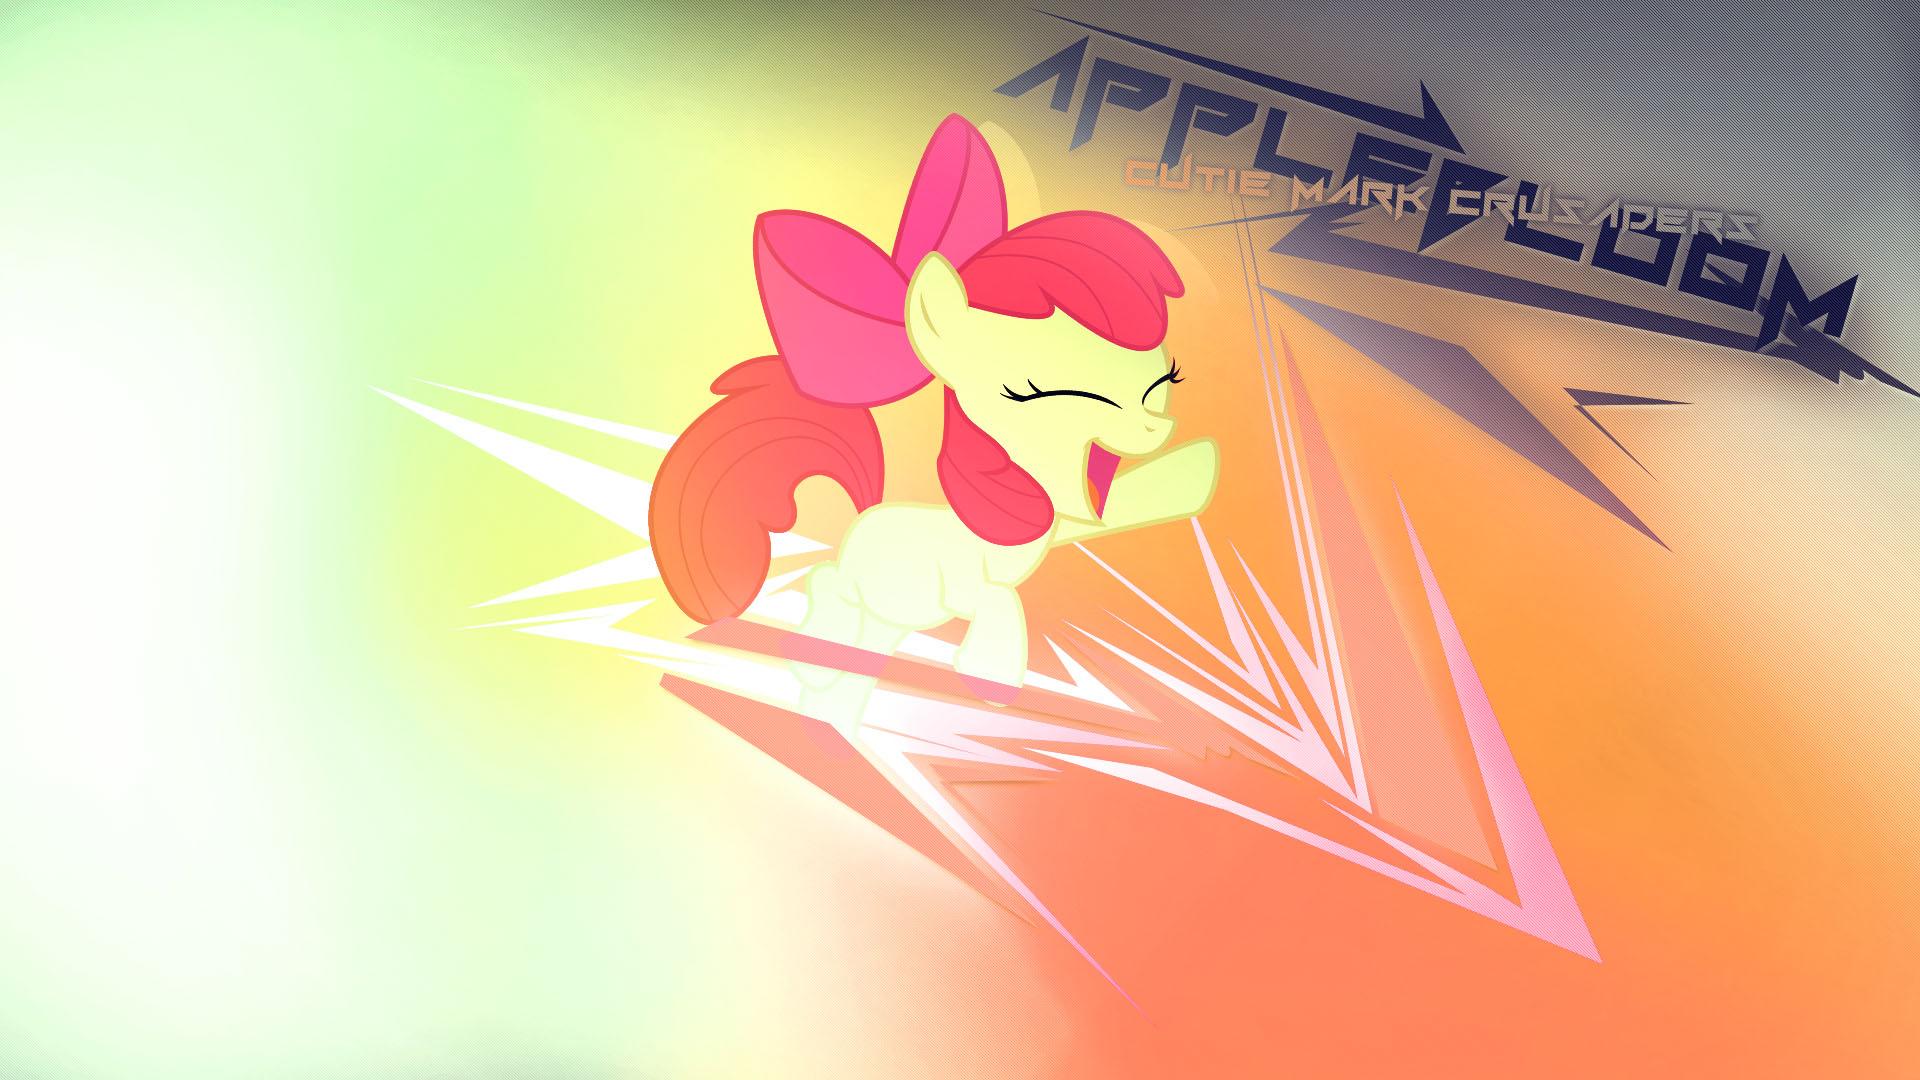 Applebloom by lightningtumble and Xtrl